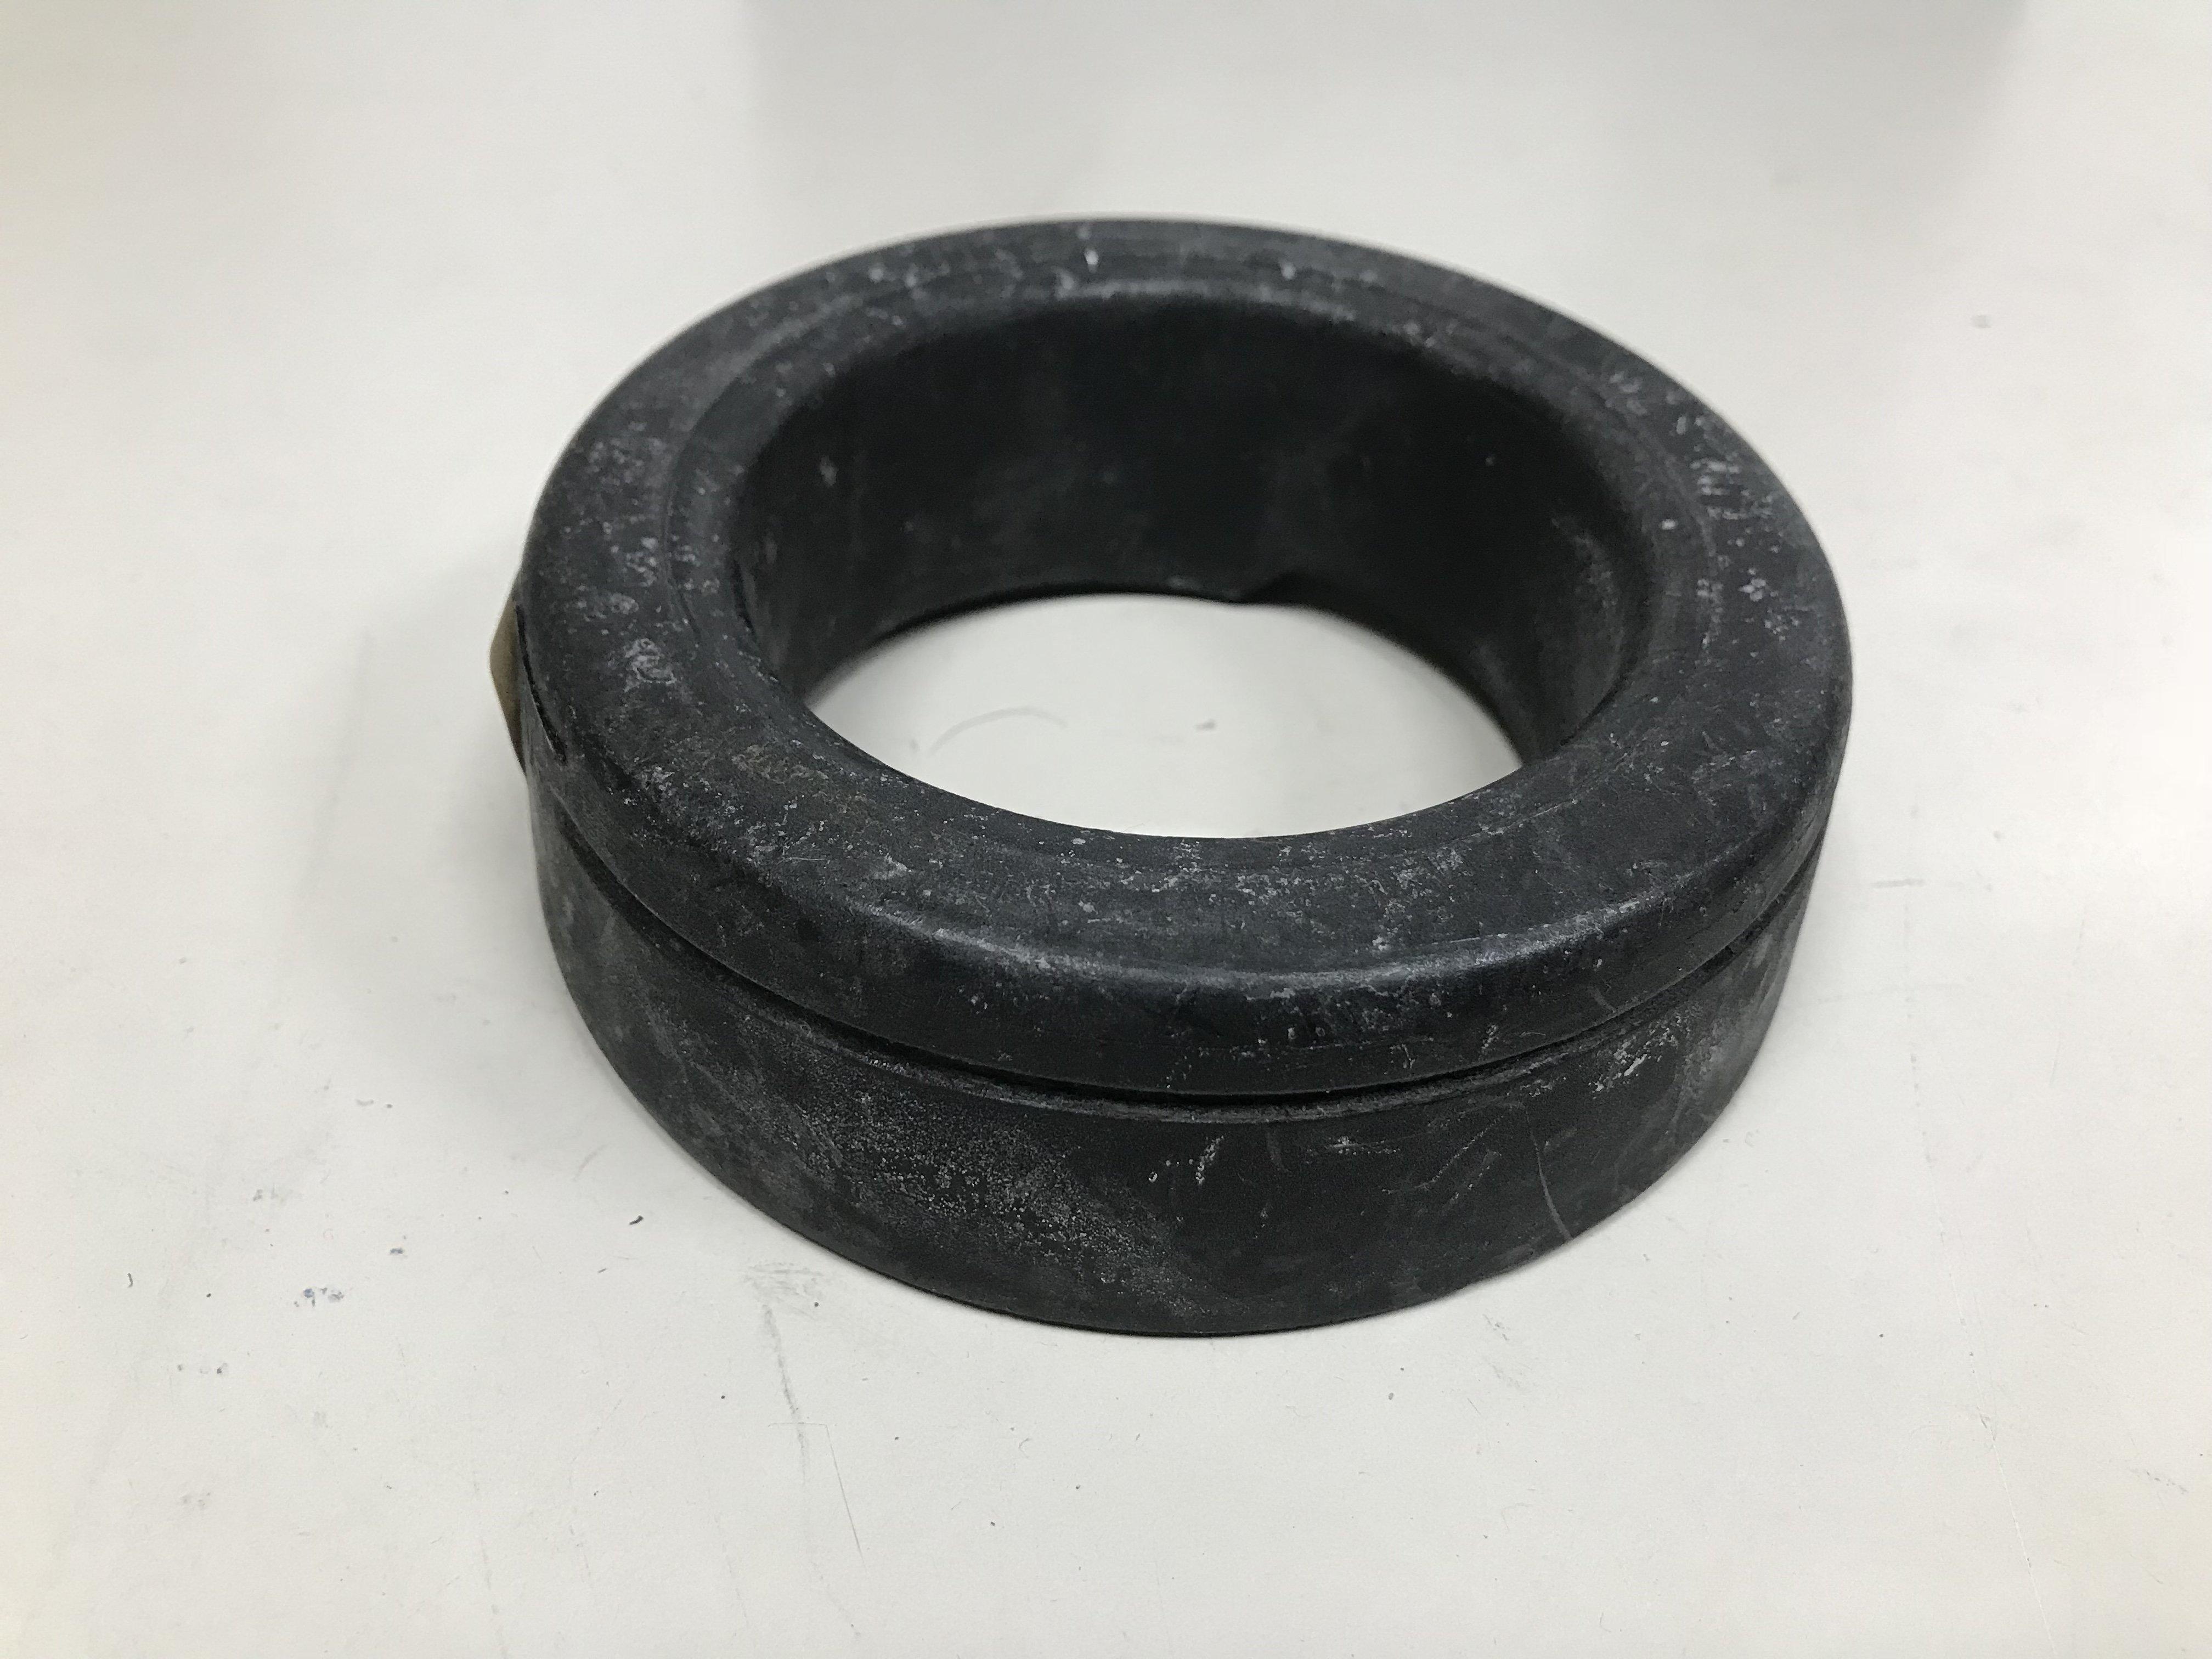 BENZ W210 1996- 前避震器彈簧墊 後避震器彈簧墊 前避震器彈簧橡皮墊 後避震器彈簧橡皮墊